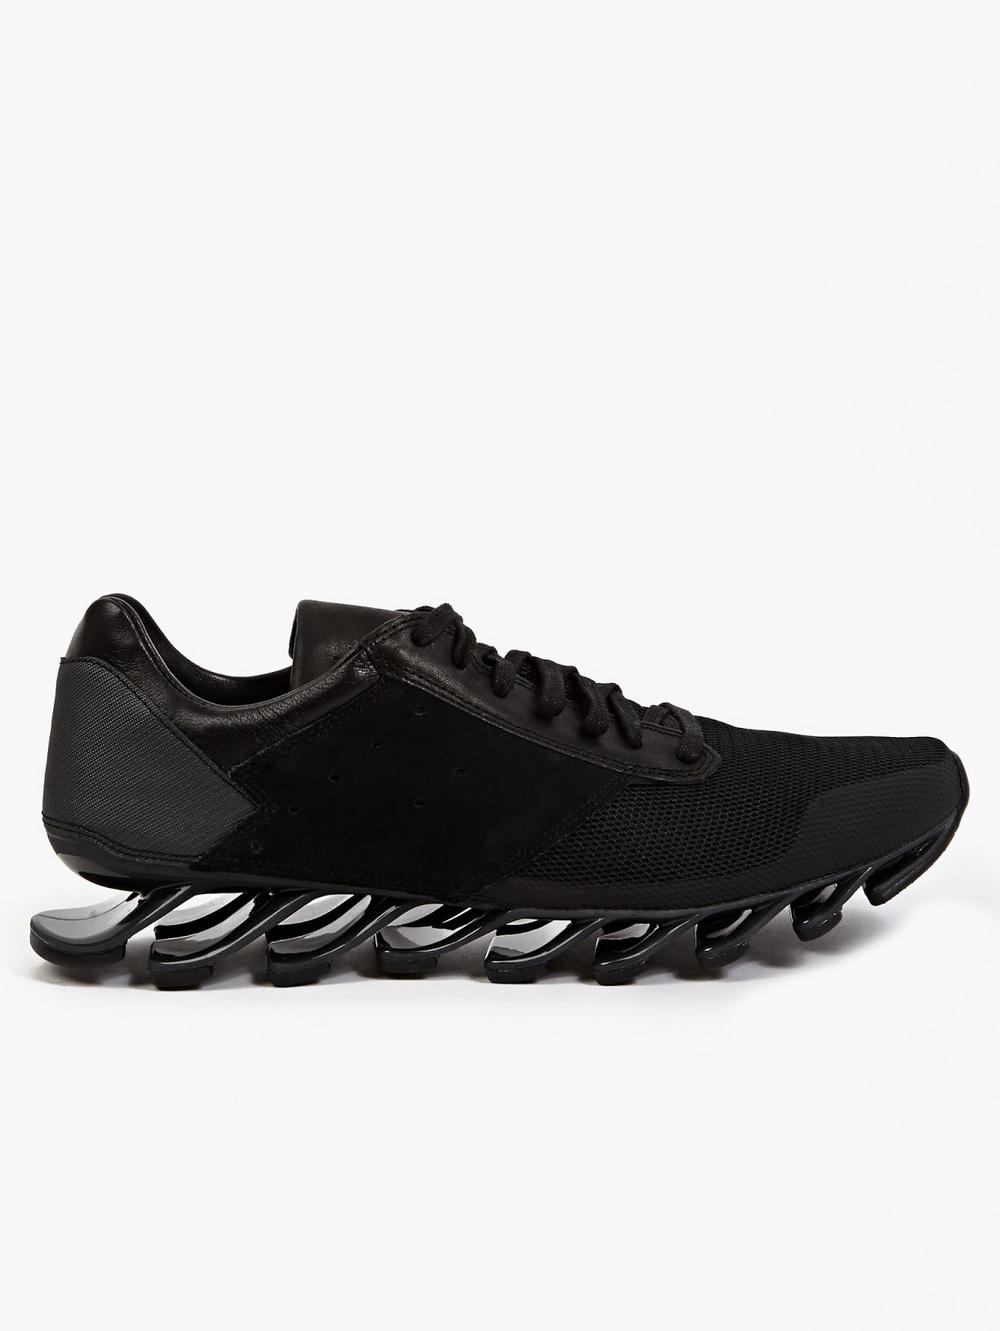 adidas-rick-owens-minimalist-edgy-sneakers1.jpg